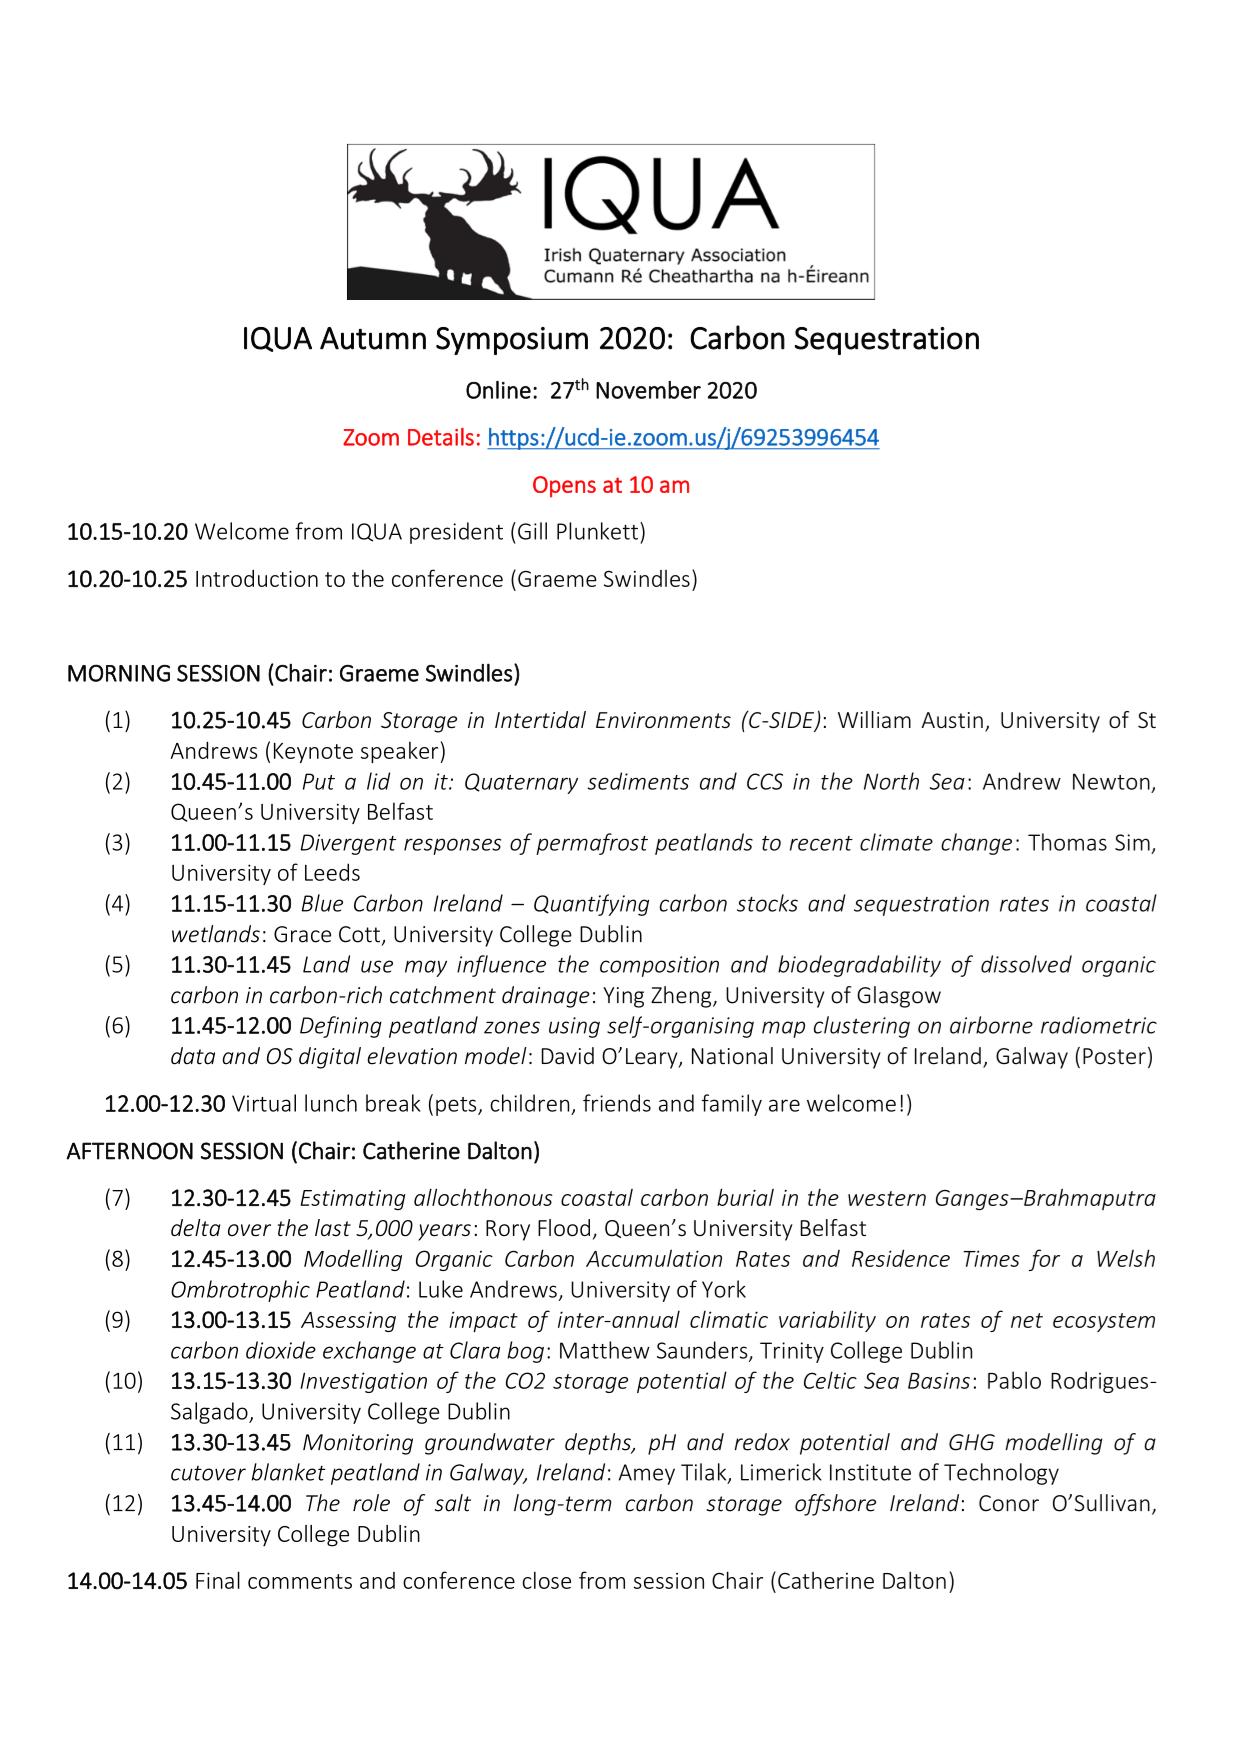 IQUA symposium 2020 programme